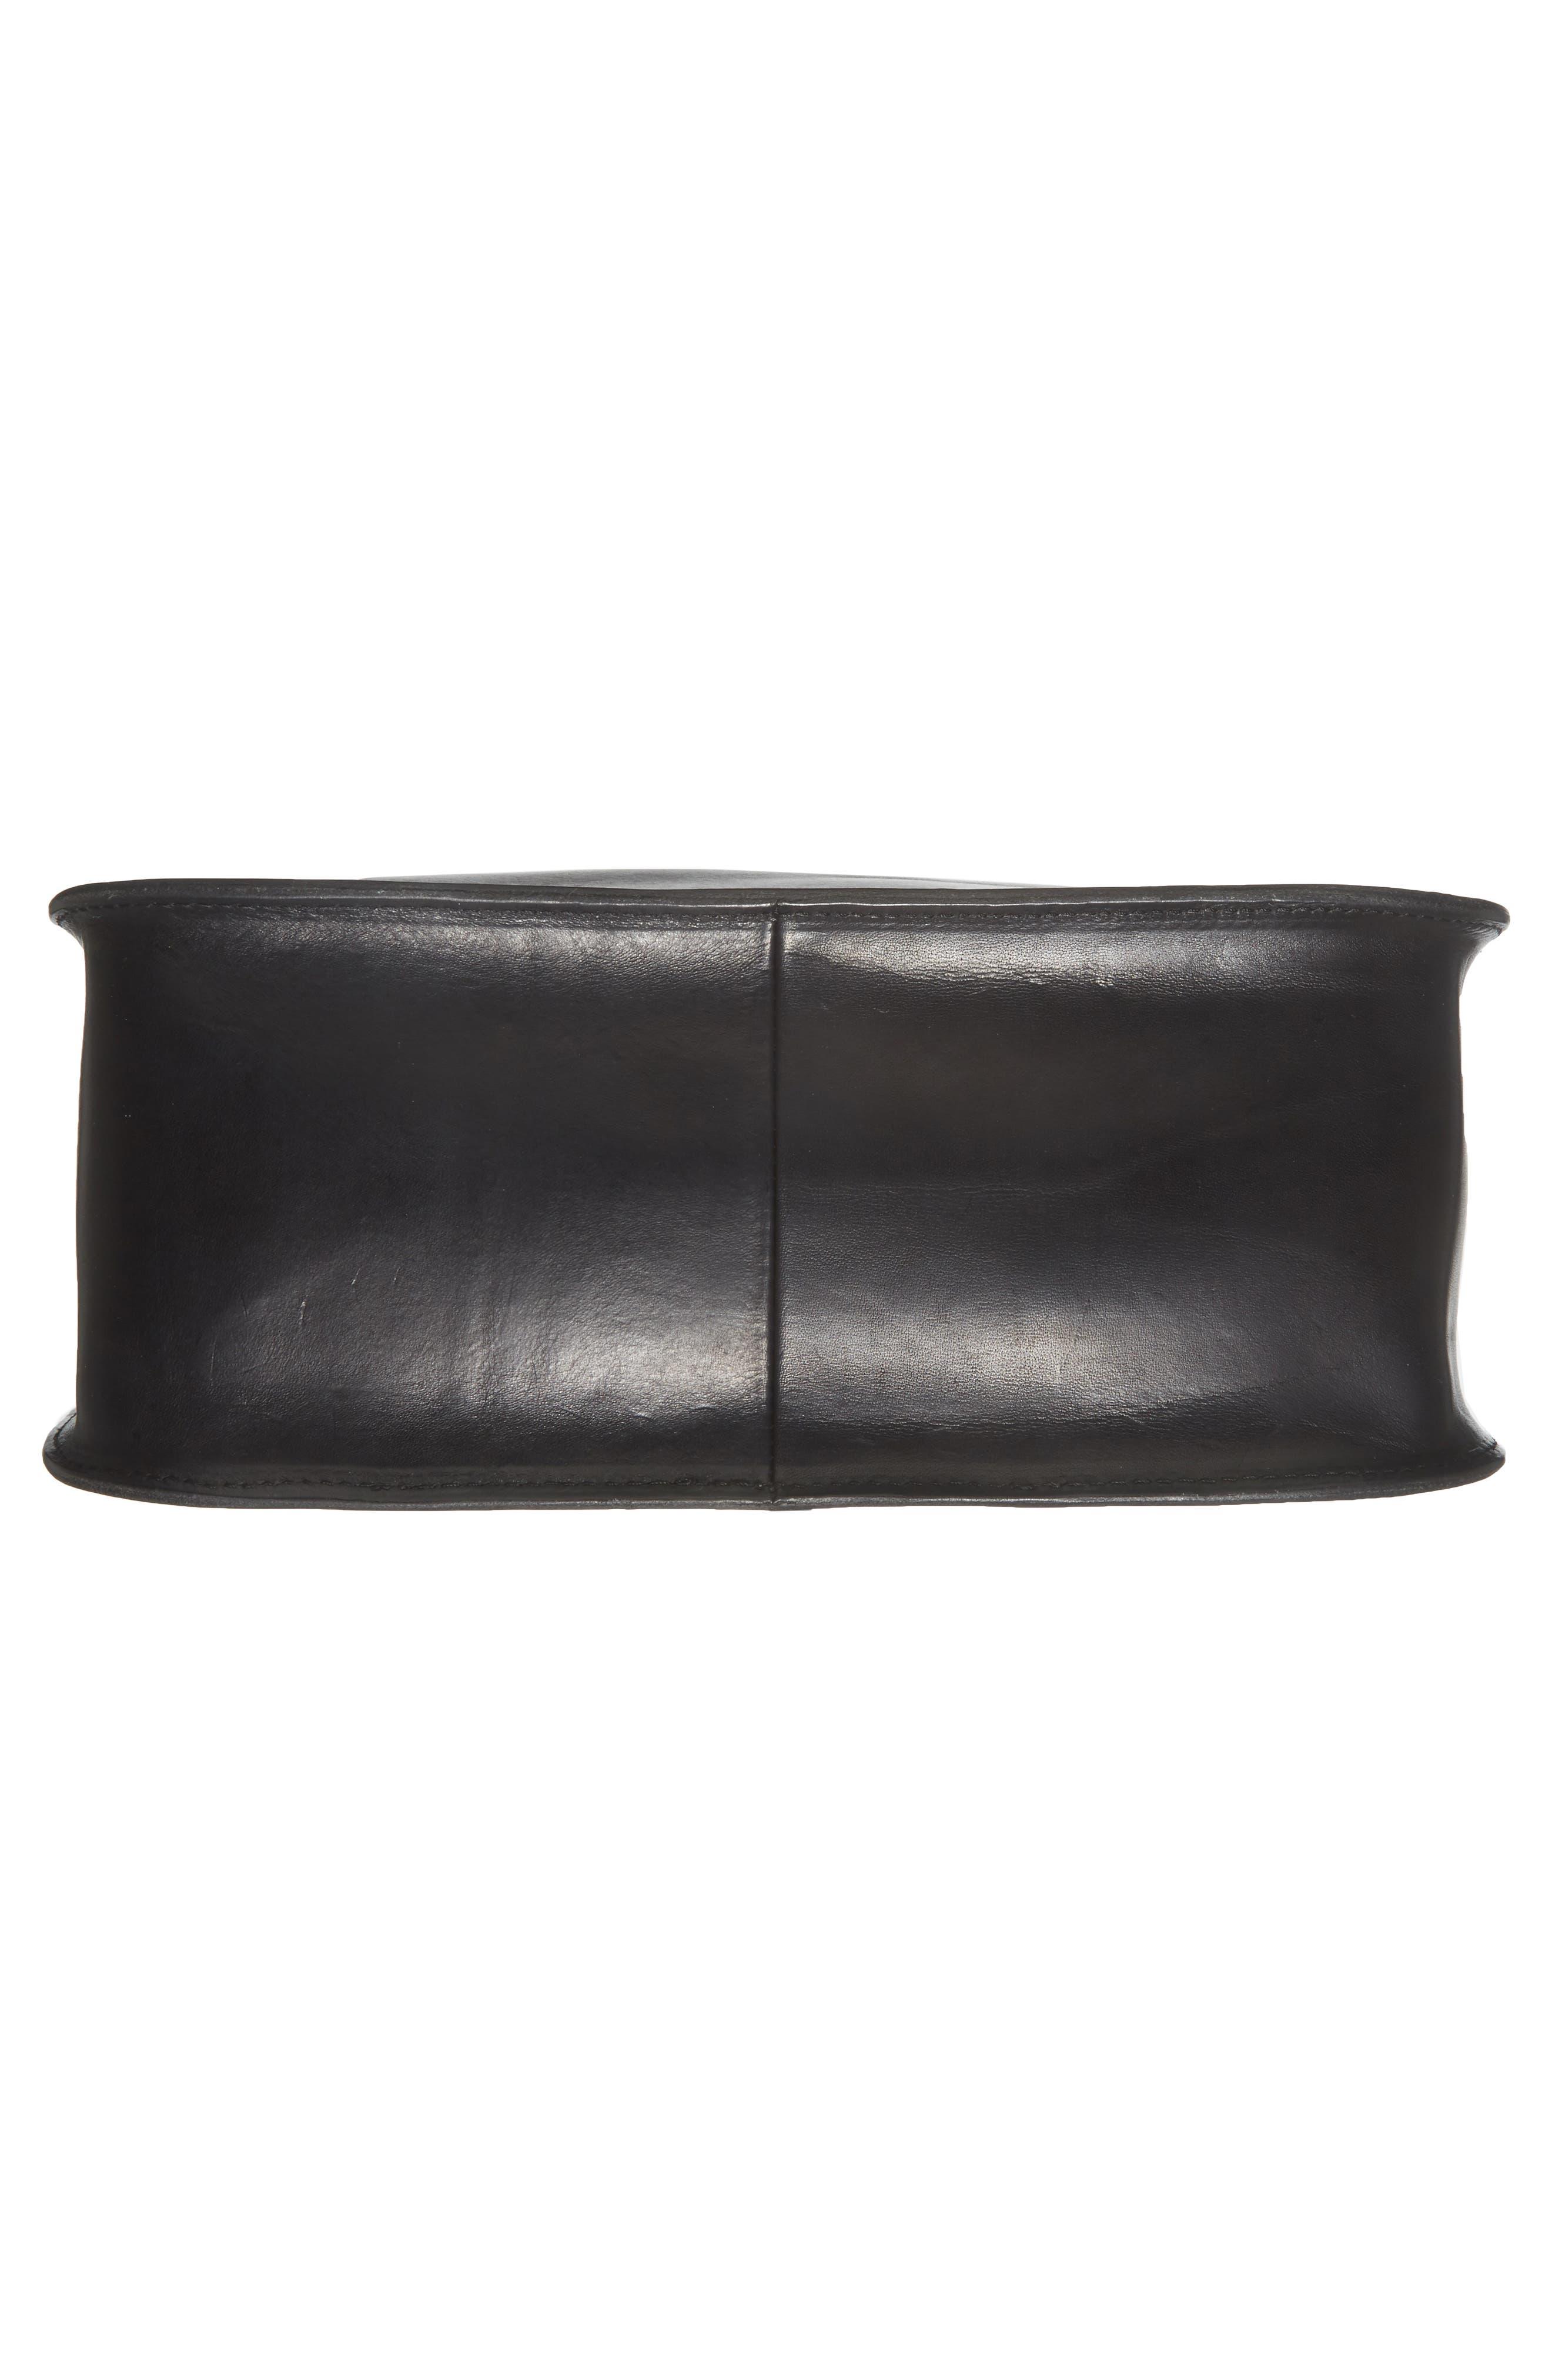 Montreal Leather Satchel,                             Alternate thumbnail 6, color,                             001